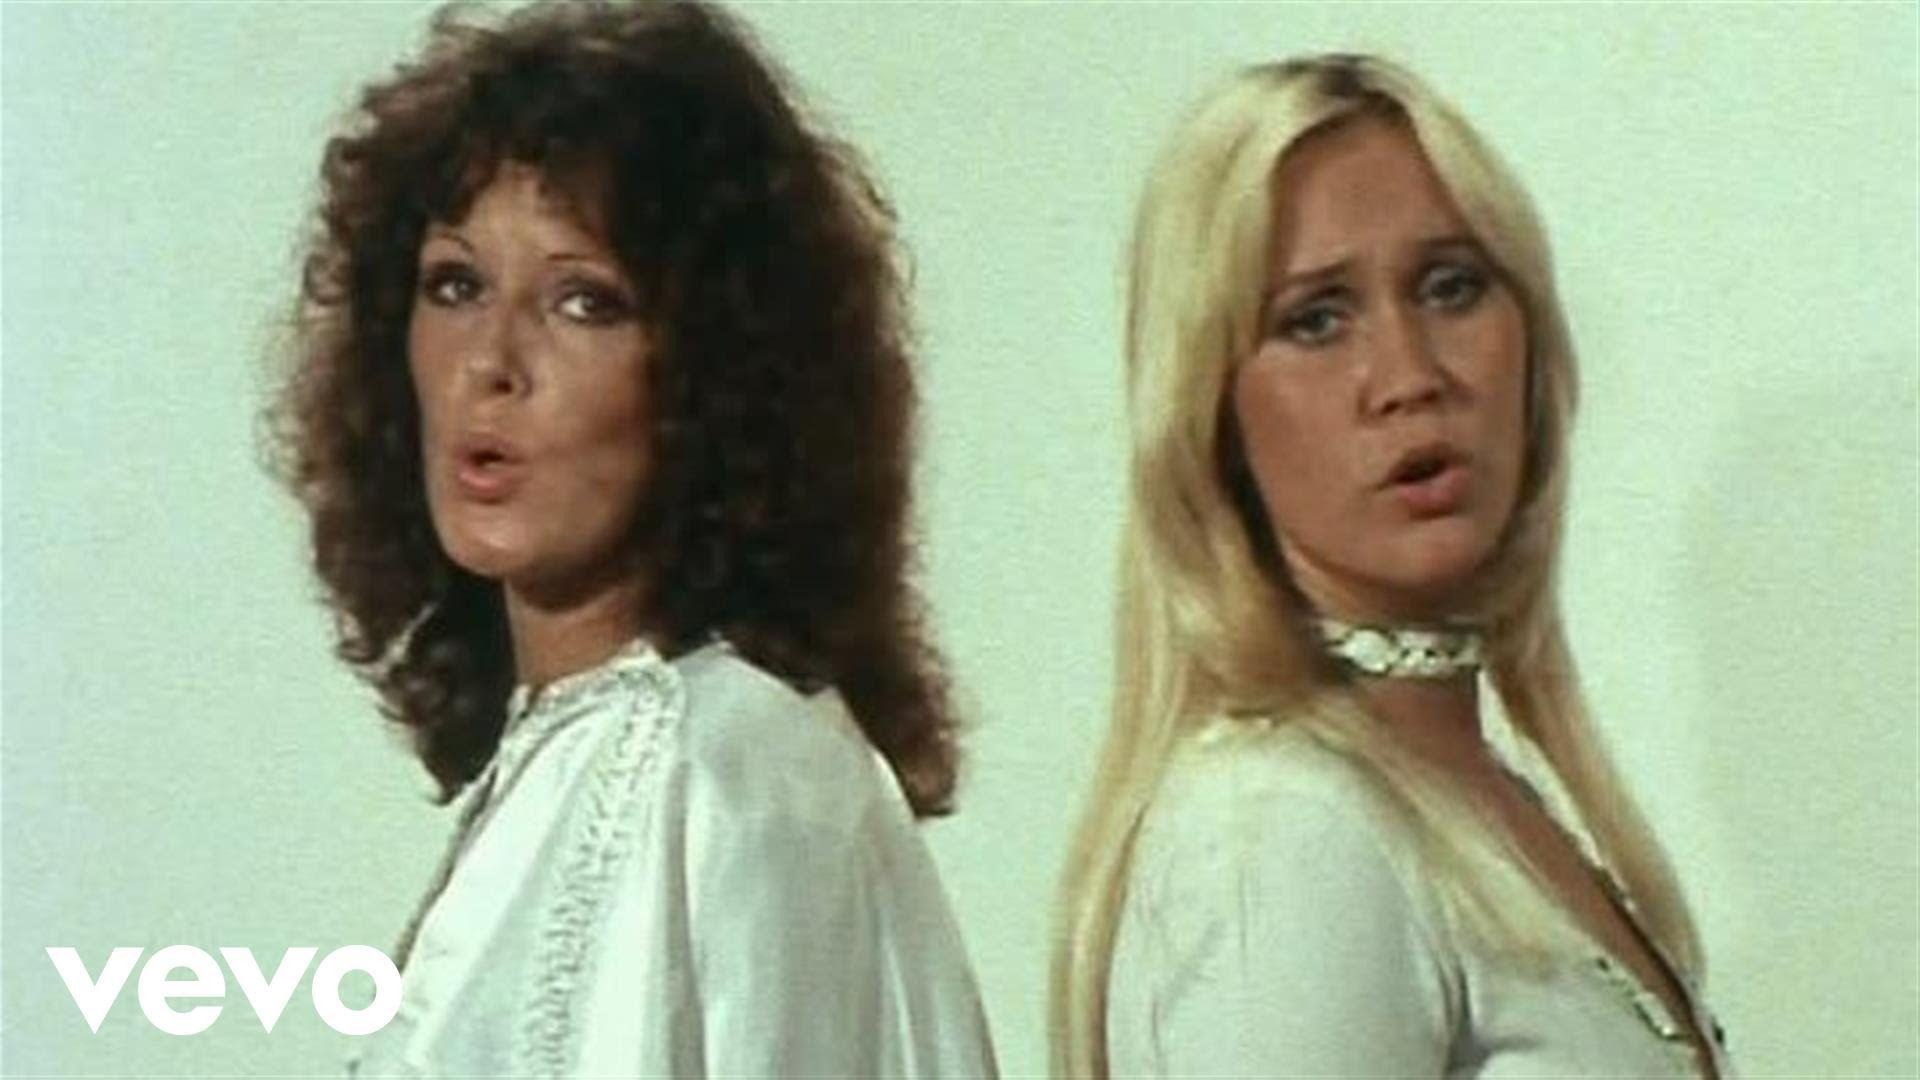 Abba - Mamma Mia Music video by Abba performing Mamma Mia. (C) 1975 Polar Music International AB